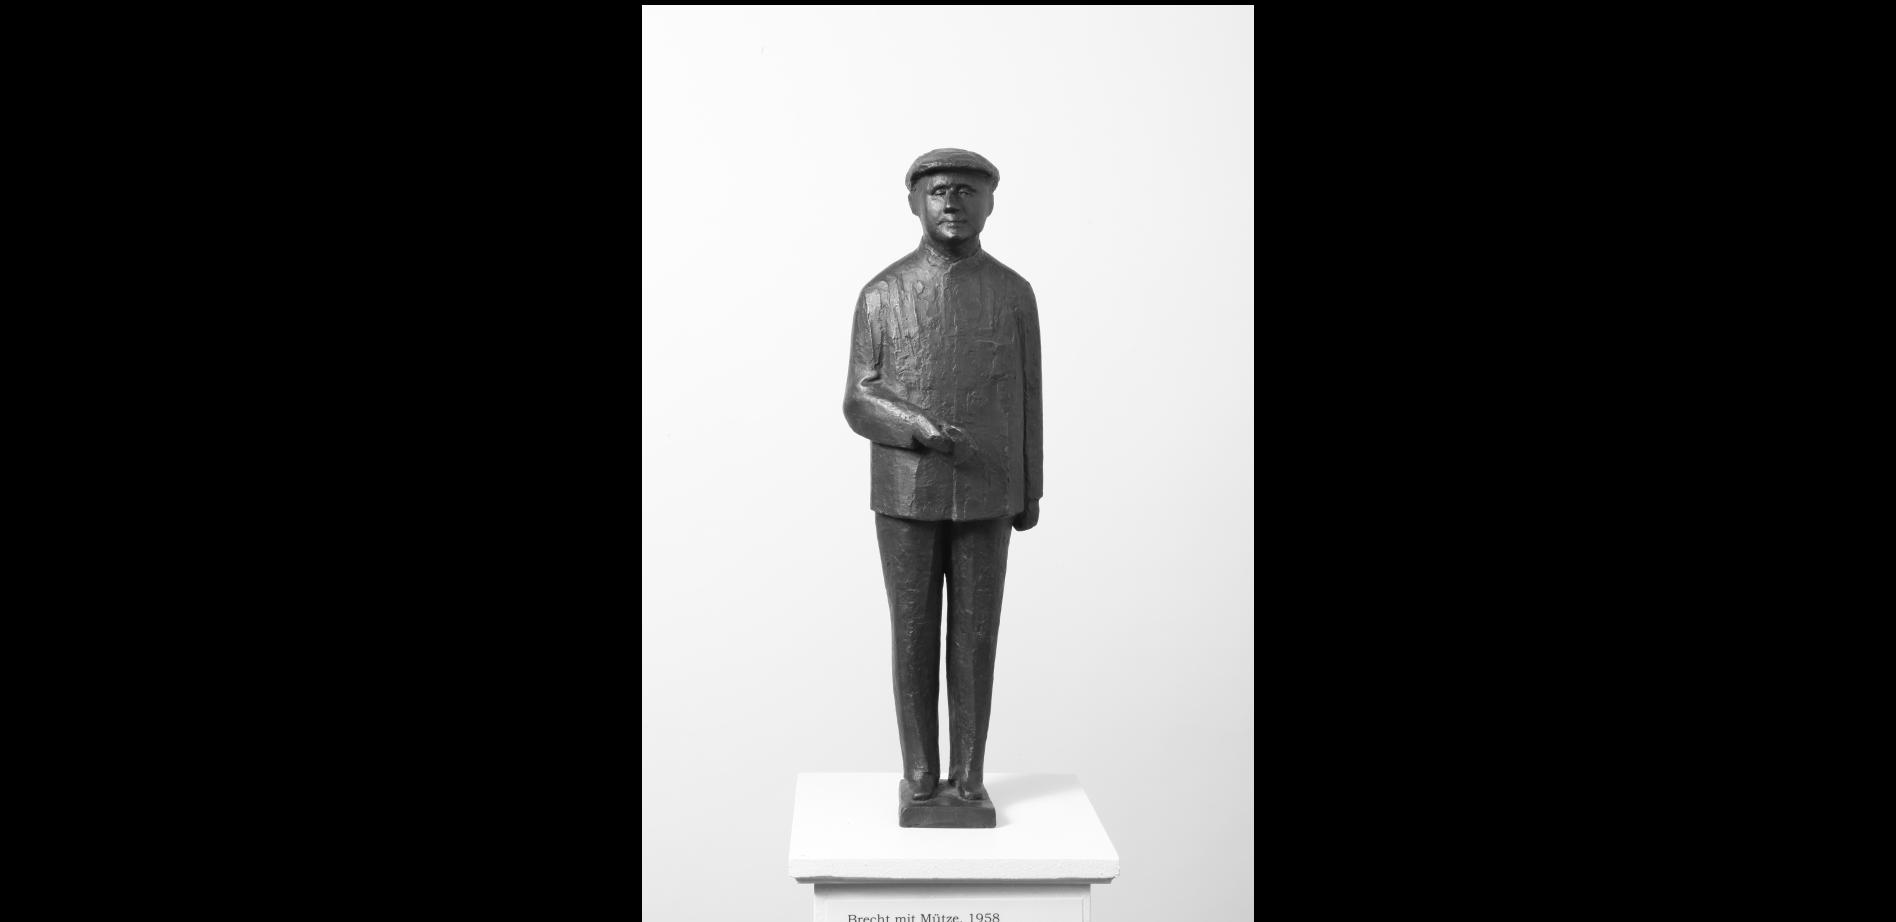 Brecht ©Wolfgang van Gulijk